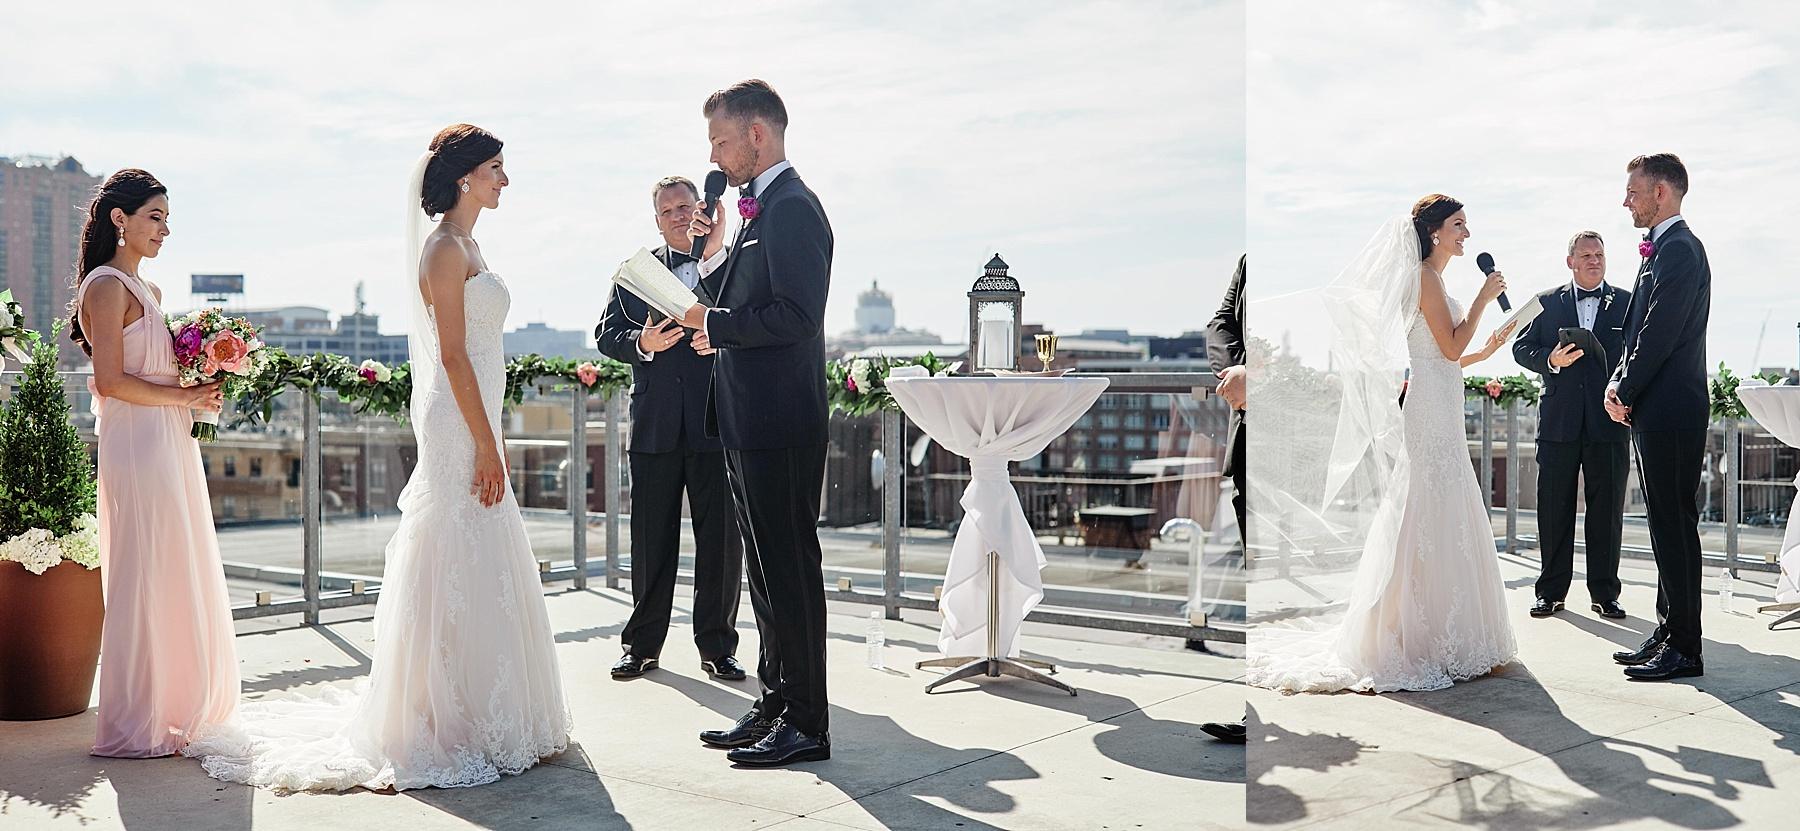 ABULAE-Wedding-Saint-paul-MN-Josh-Sofia-Wedding-Mears-Park_0766.jpg